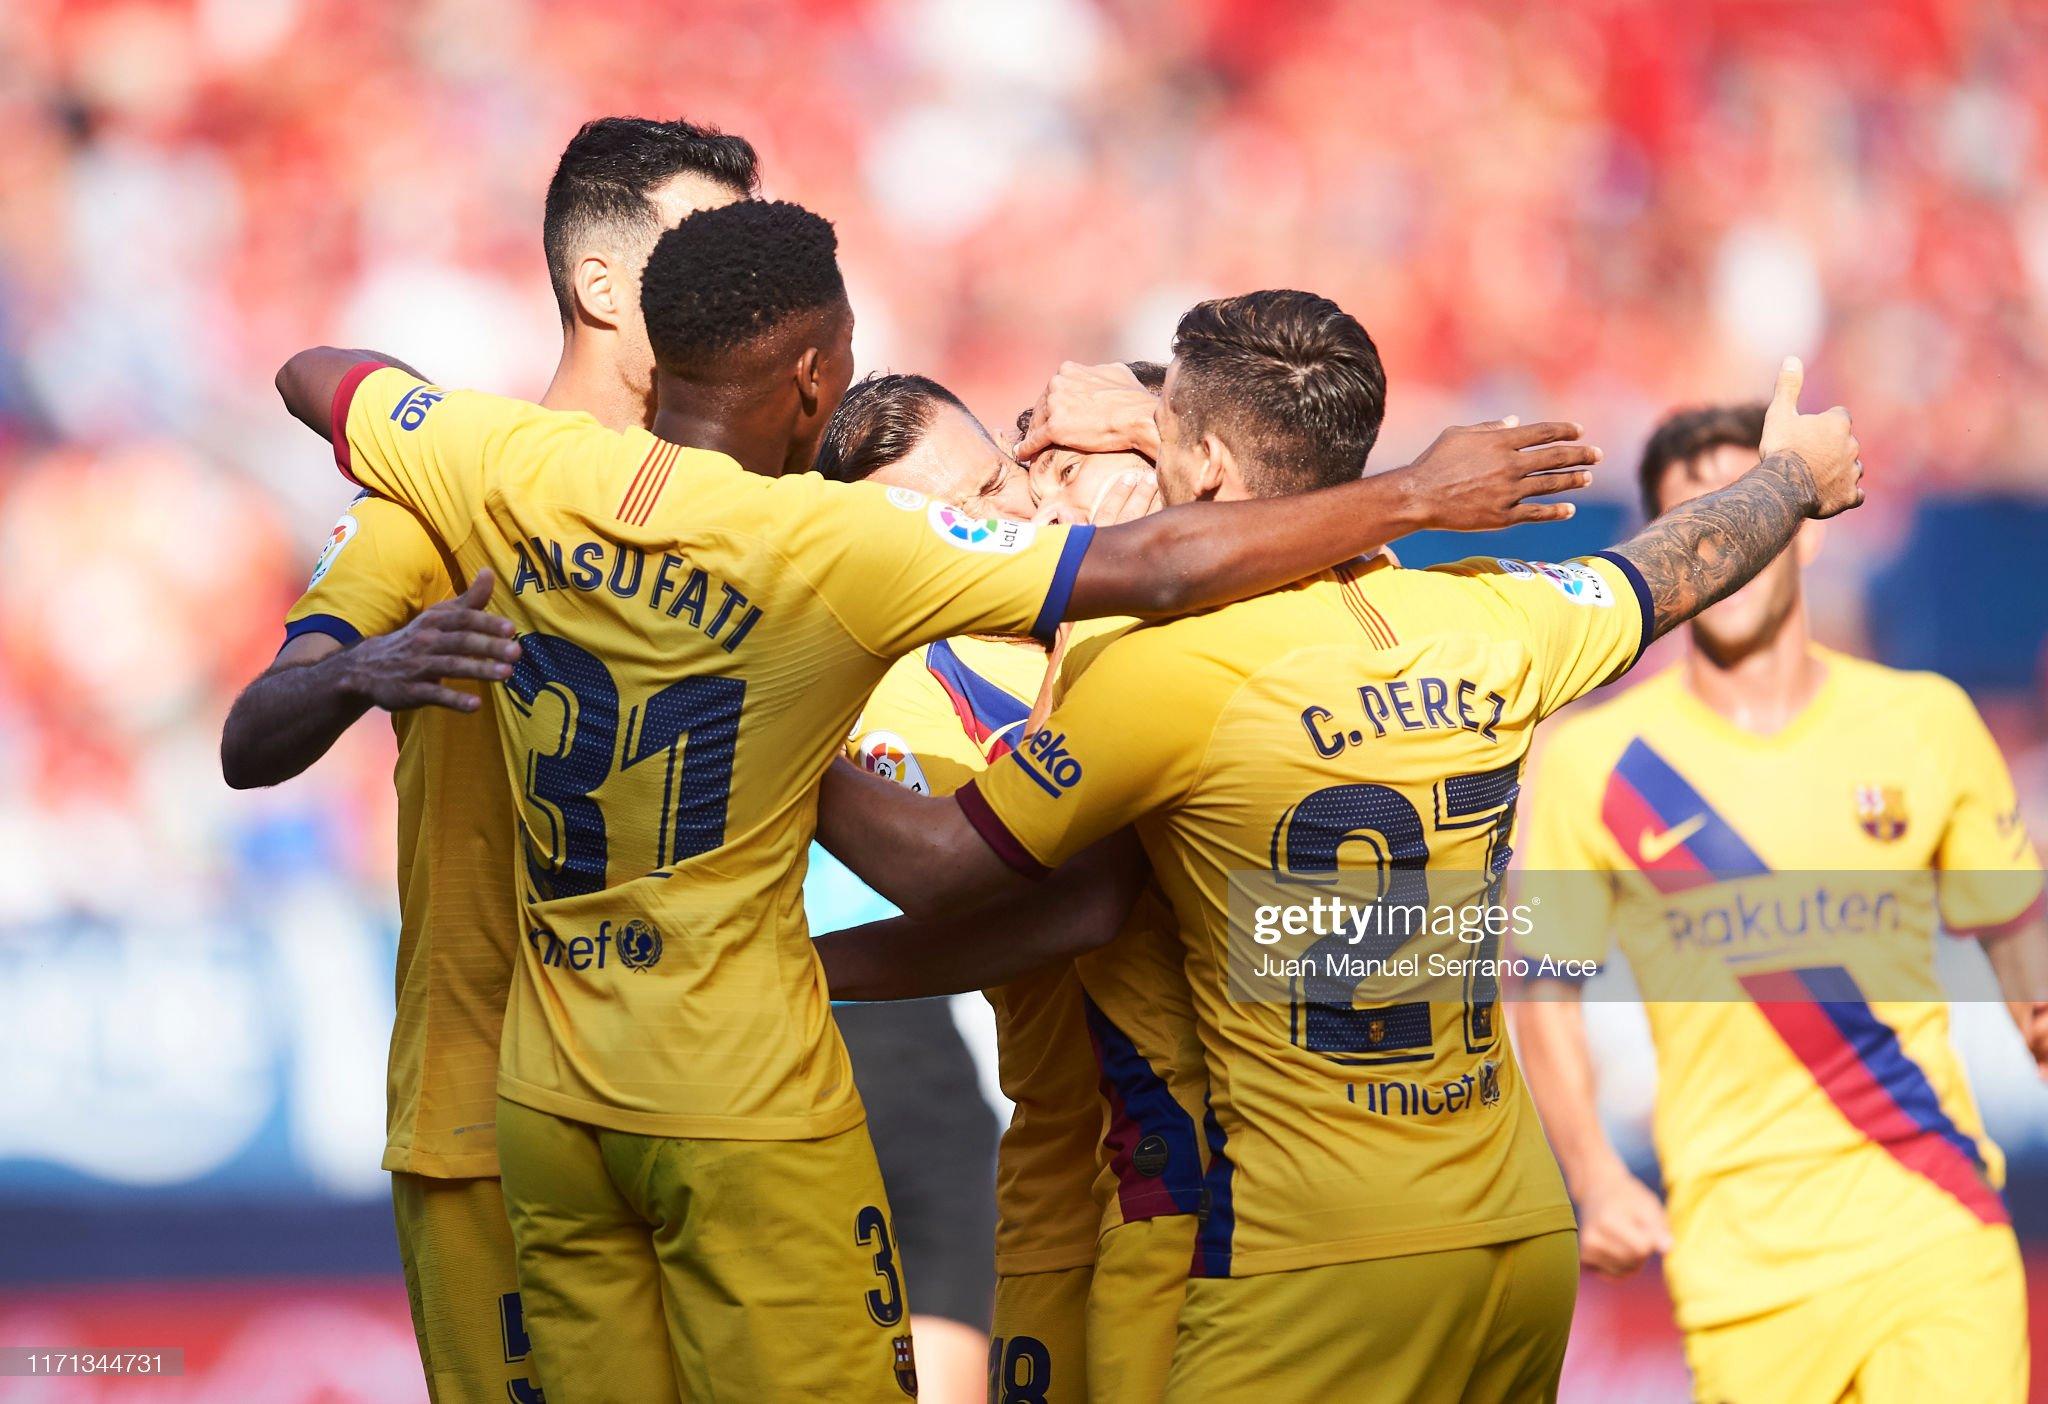 صور مباراة : أوساسونا - برشلونة 2-2 ( 31-08-2019 )  Arthur-melo-of-fc-barcelona-celebrates-with-teammates-after-scoring-picture-id1171344731?s=2048x2048